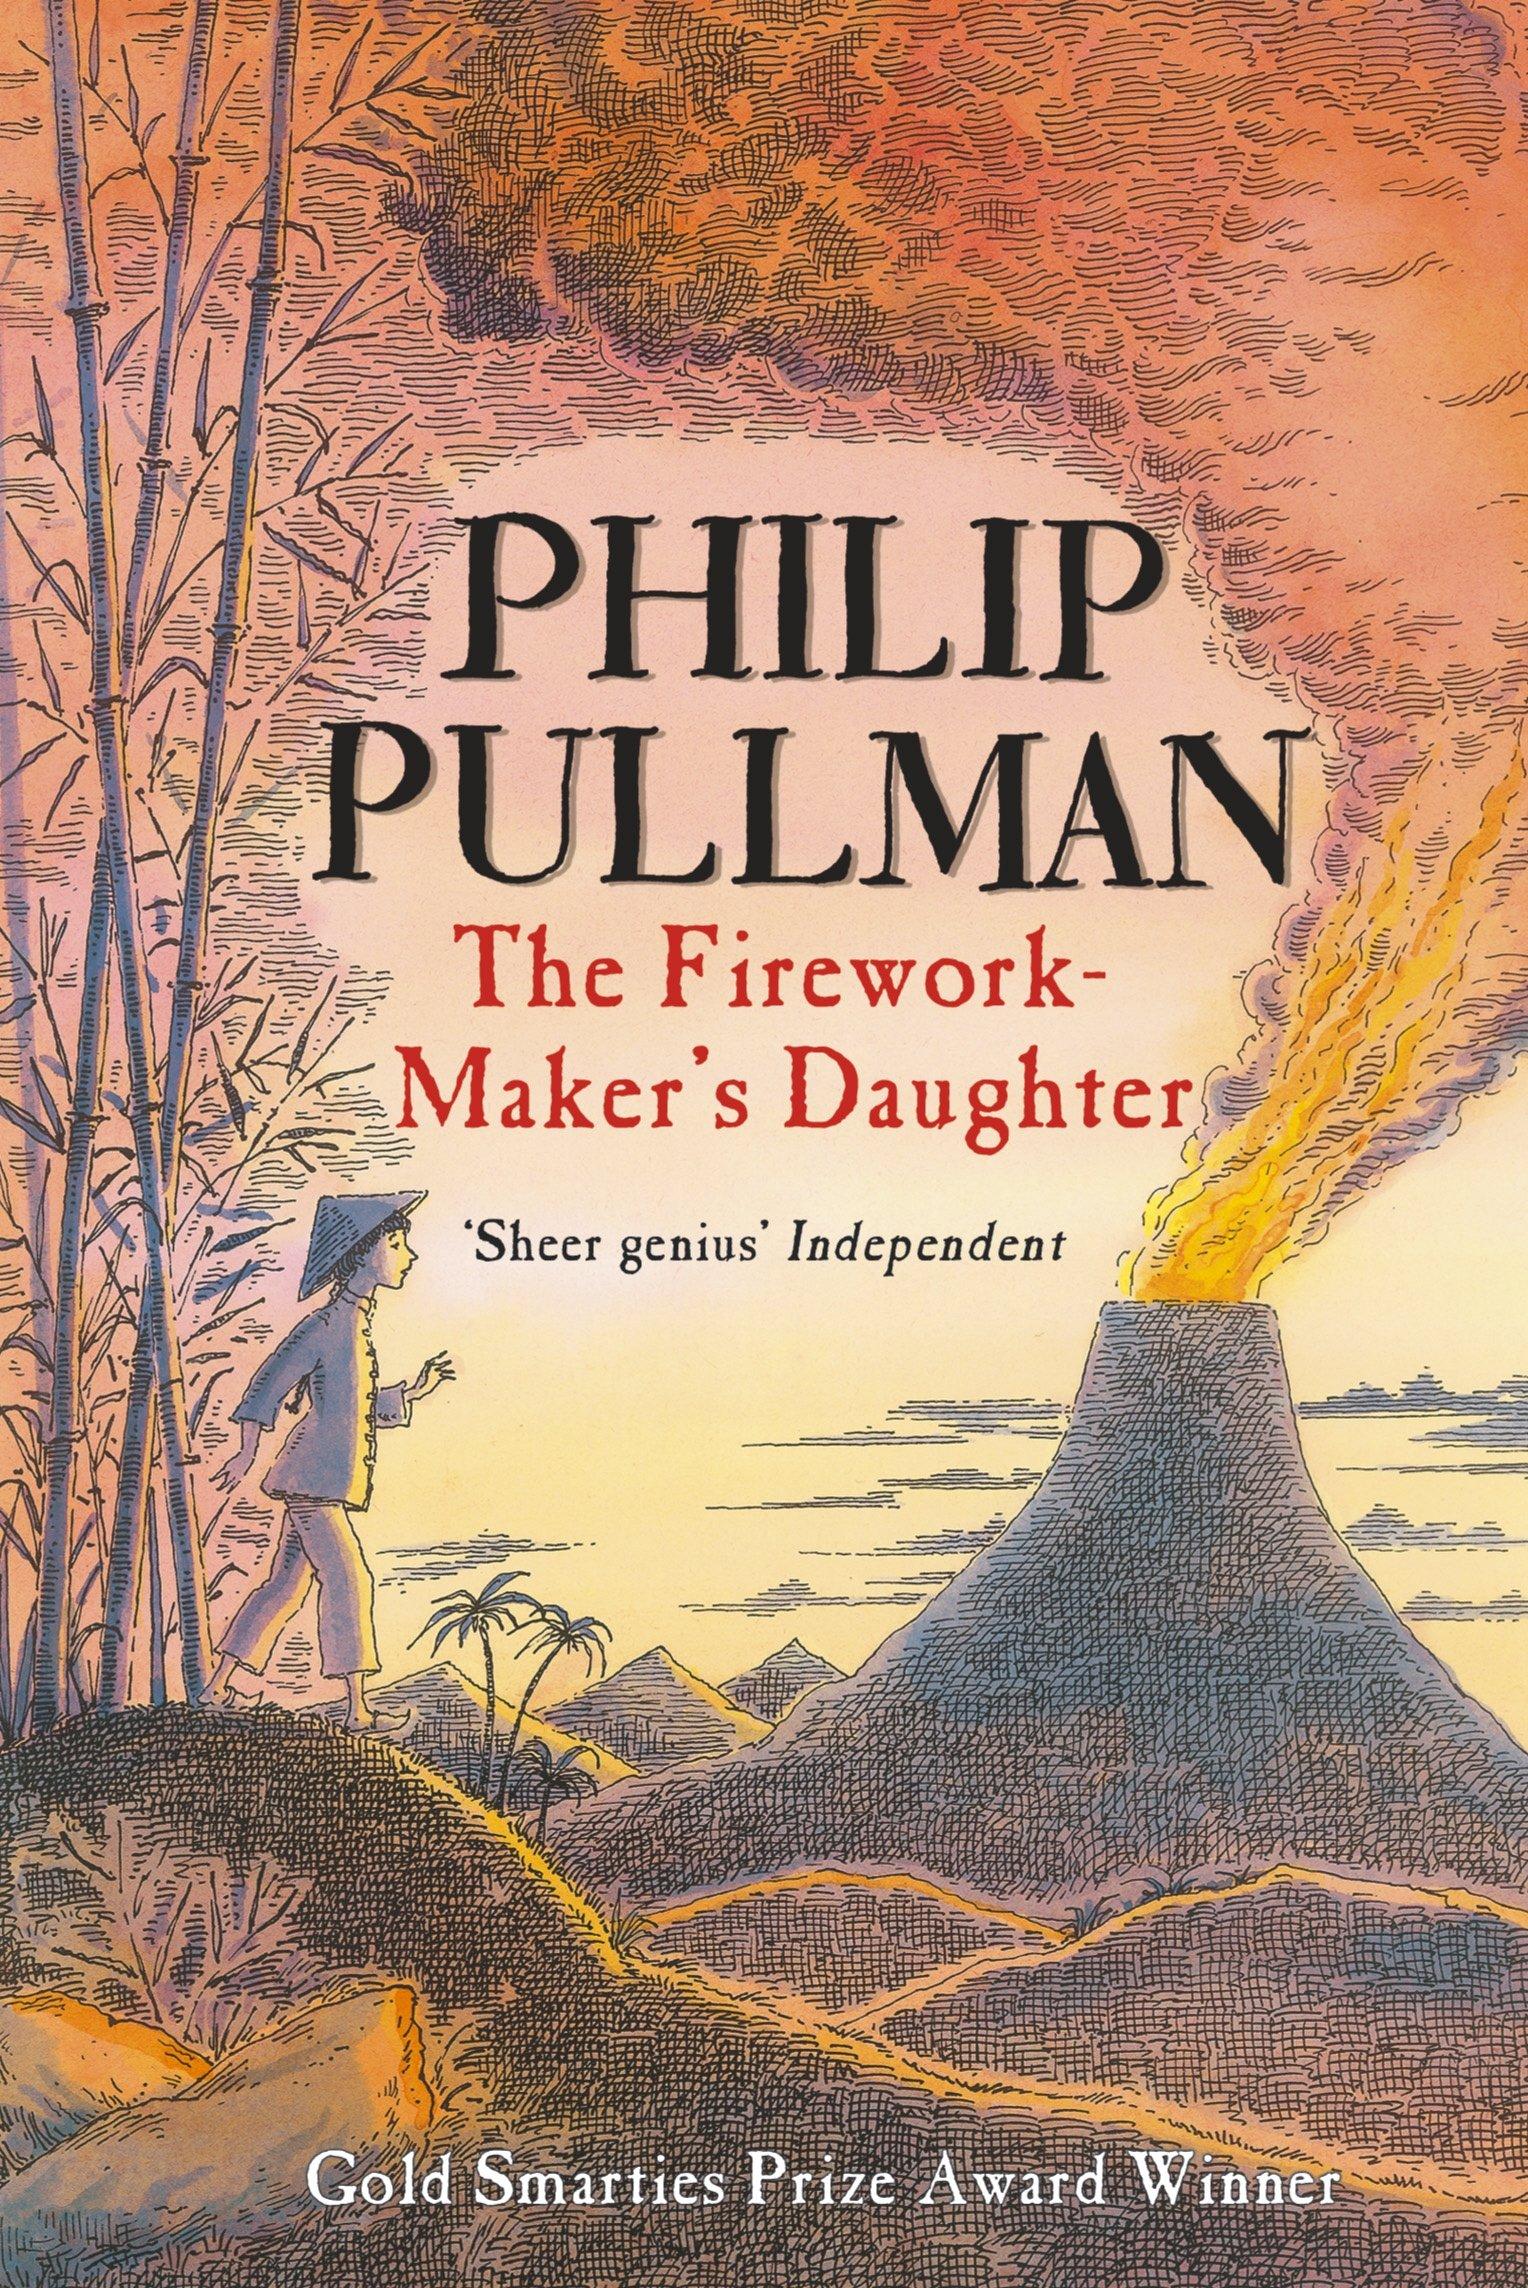 The Firework Maker's Daughter: Amazon.co.uk: Pullman, Philip: Books